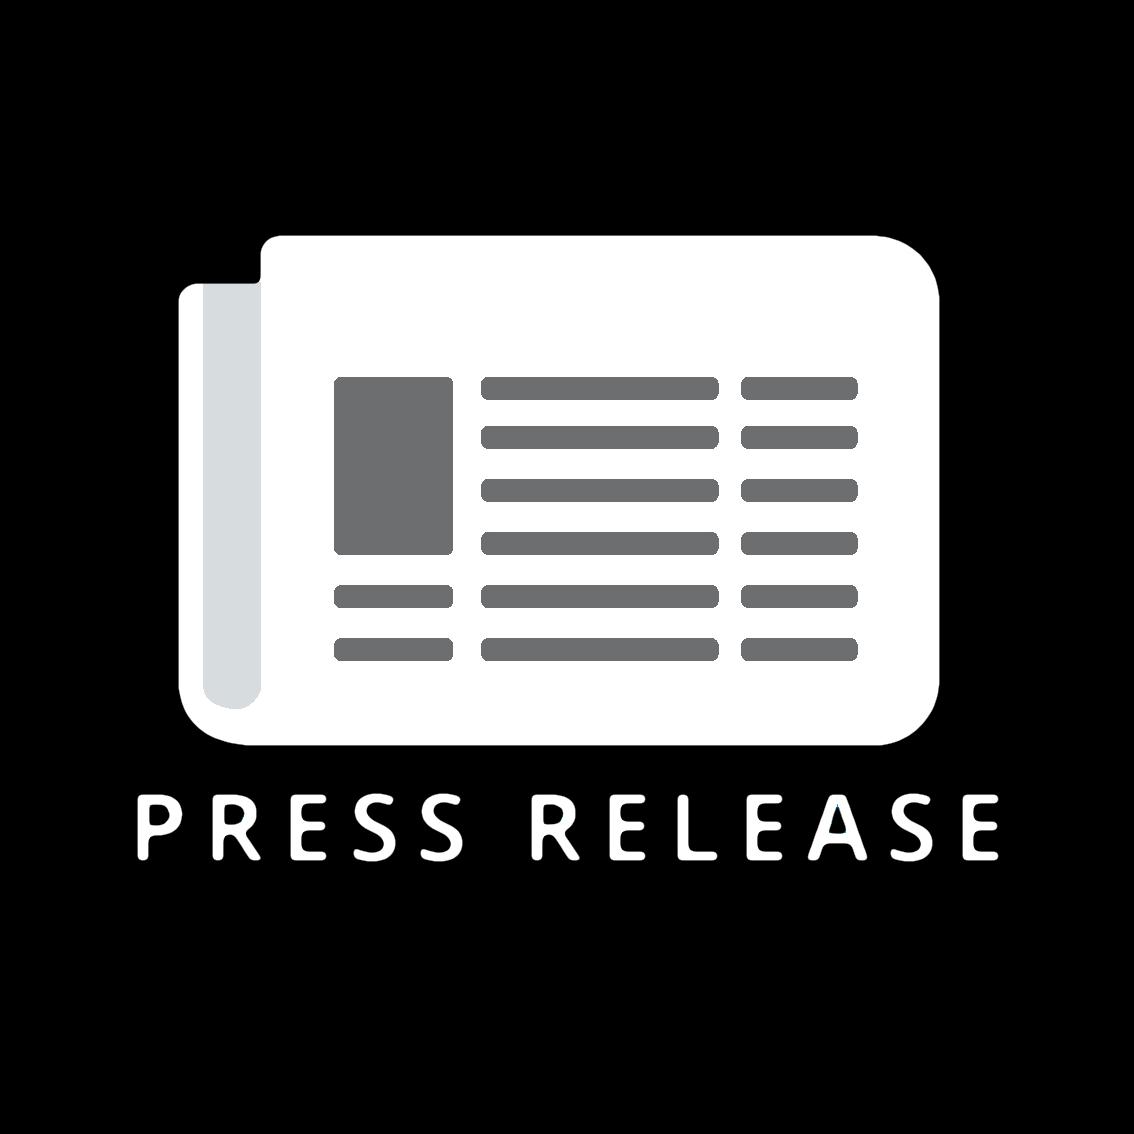 press-release blk